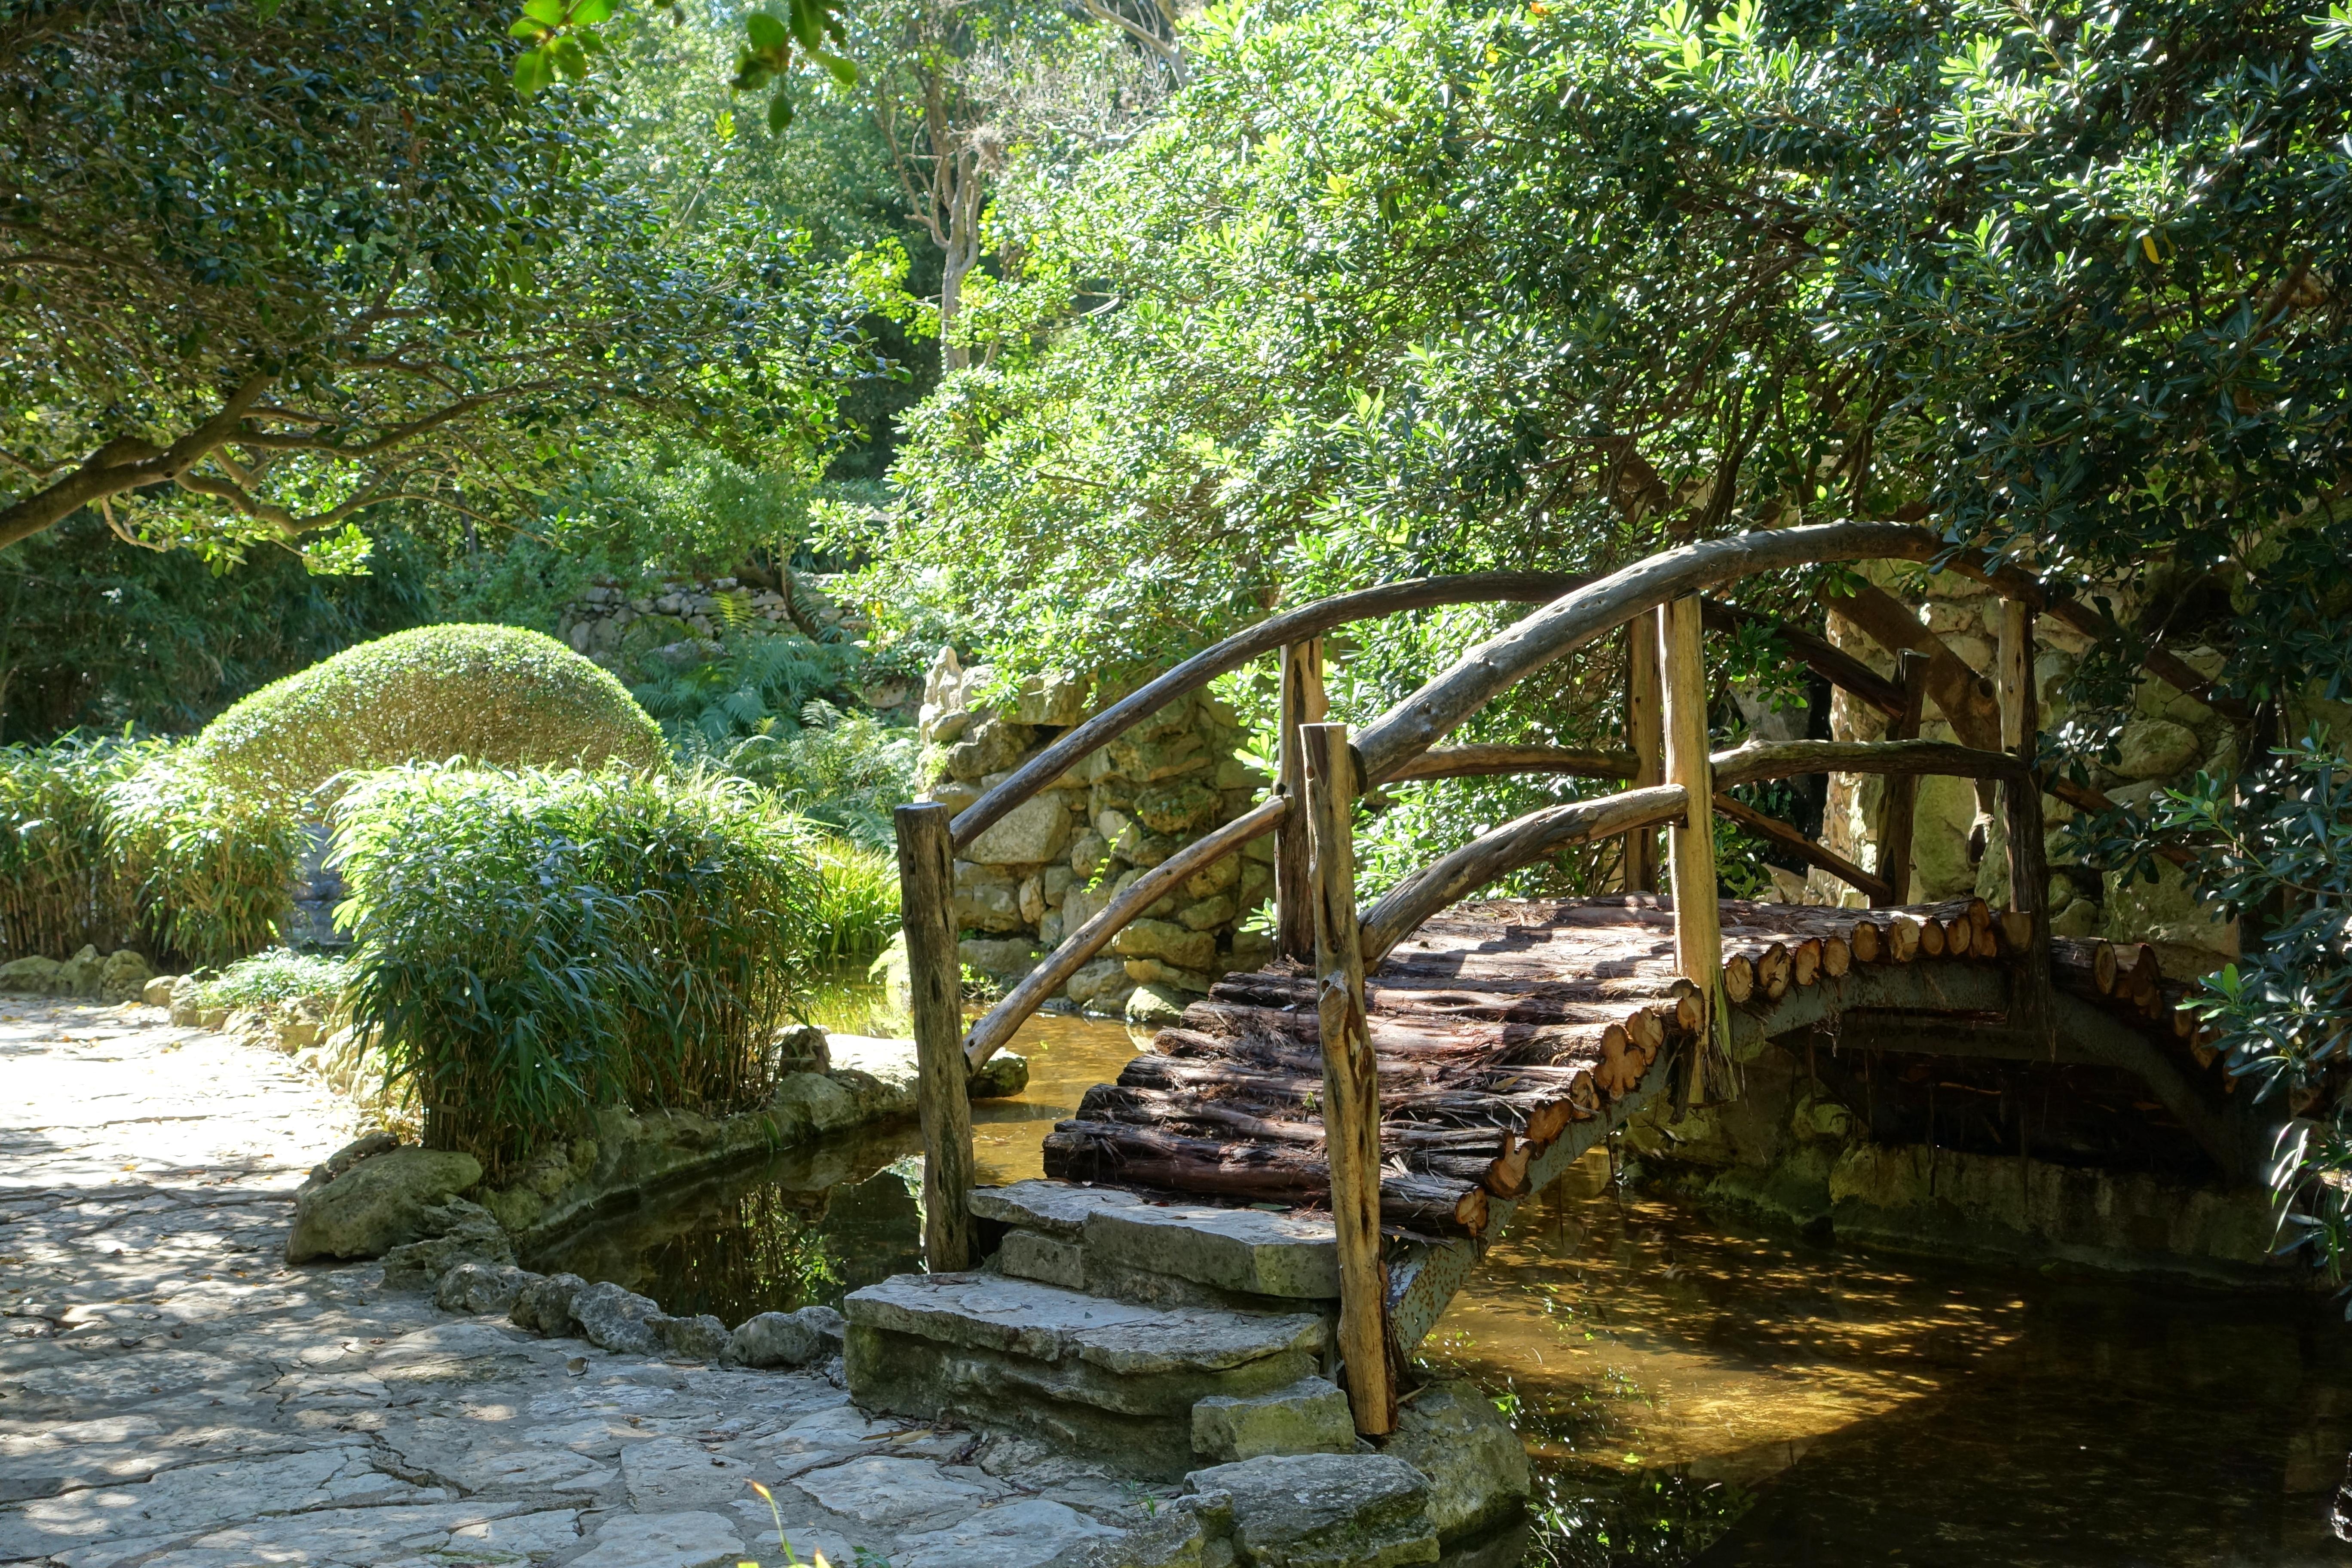 Merveilleux File:Bridge   Isamu Taniguchi Japanese Garden   Zilker Botanical Garden    Austin, Texas